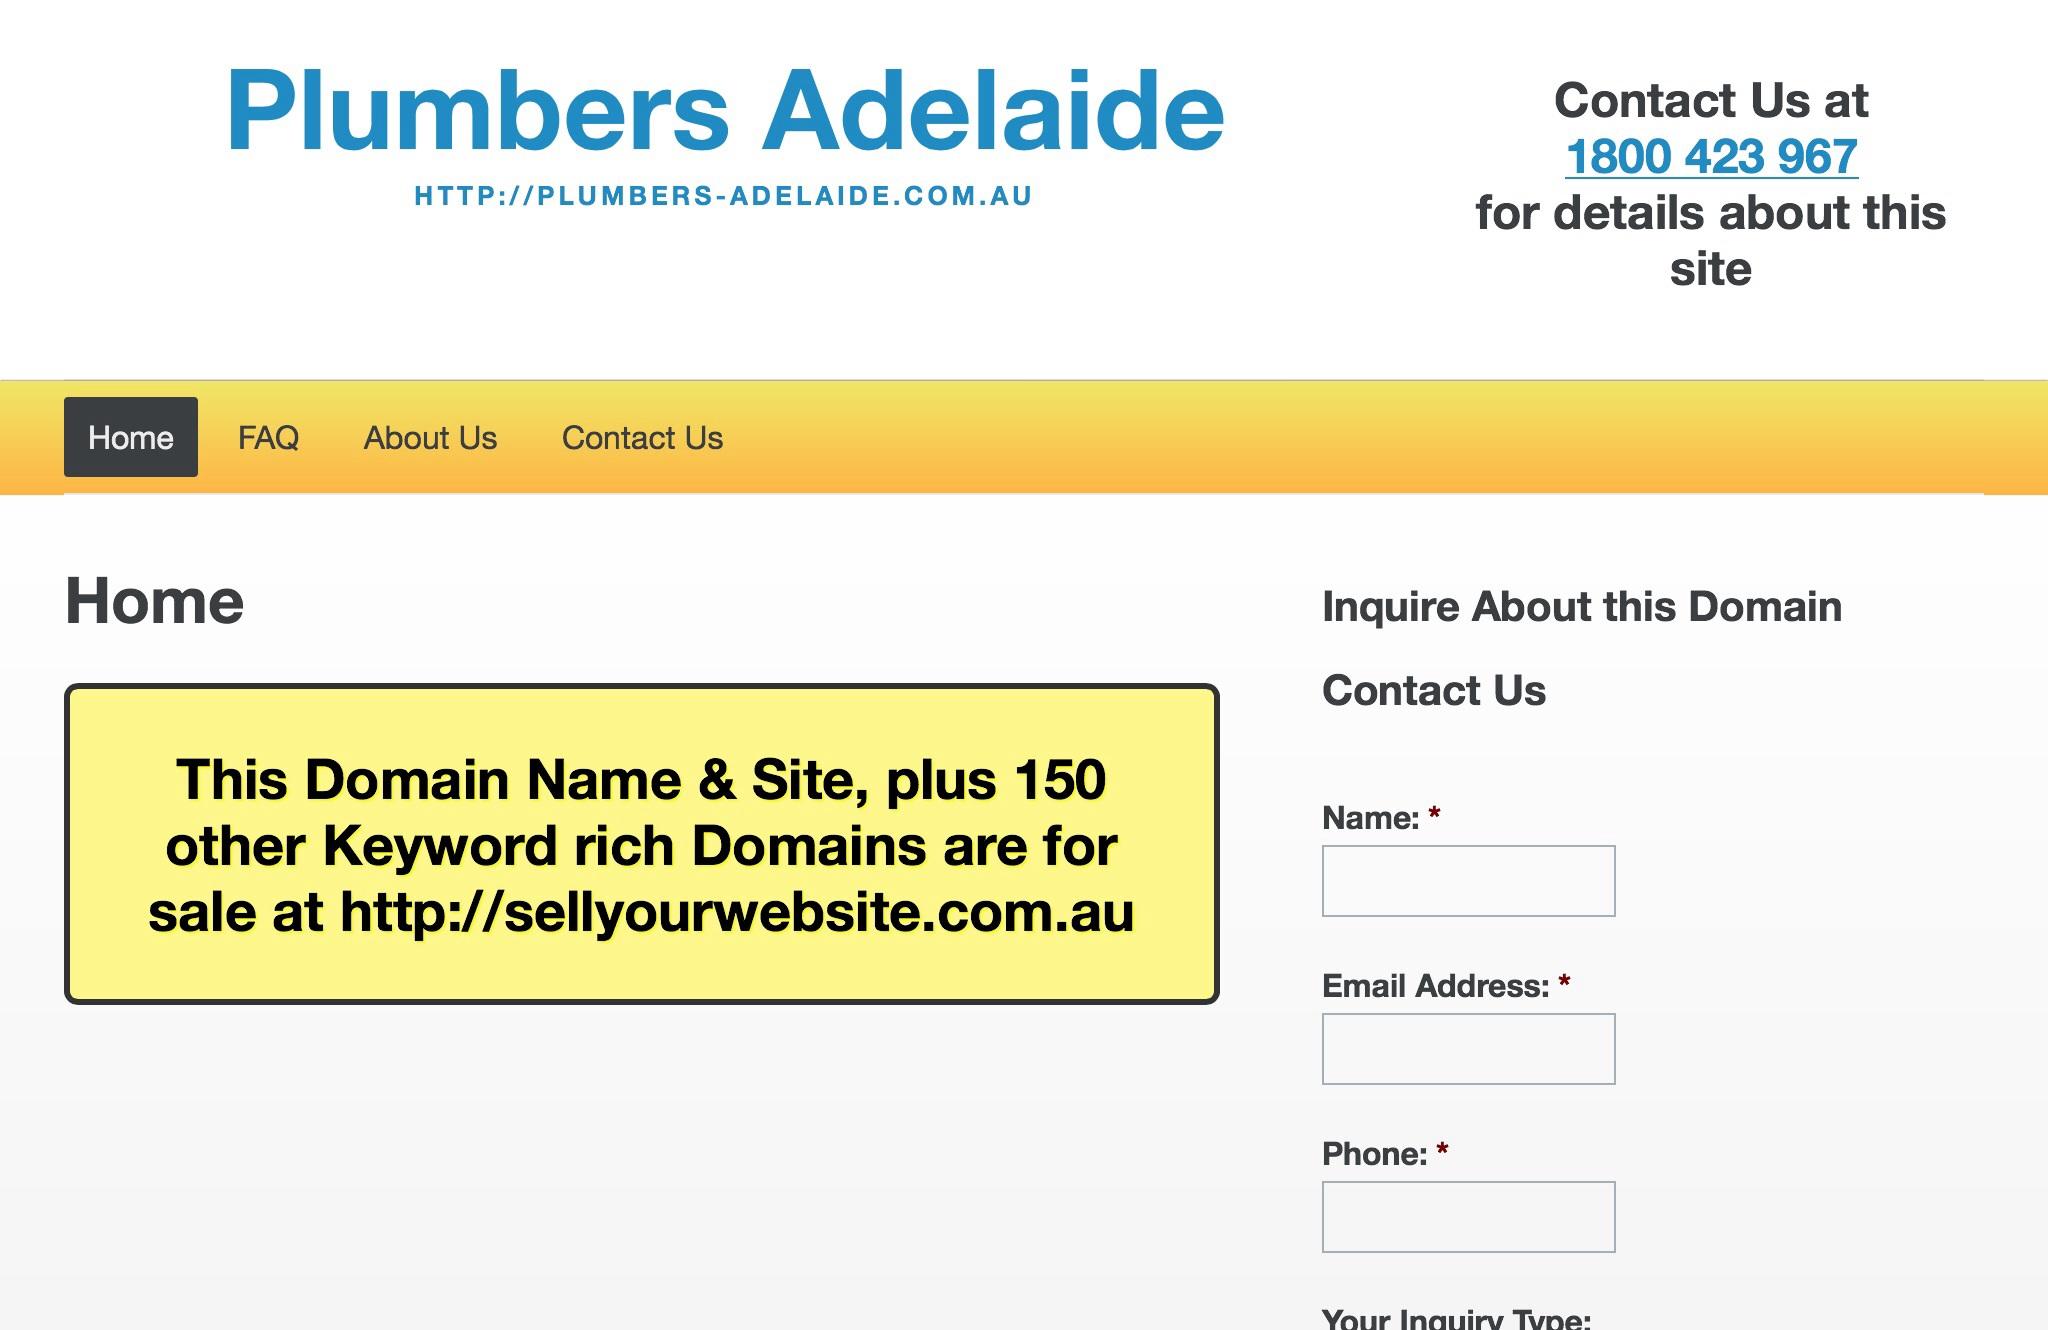 Plumbers Adelaide